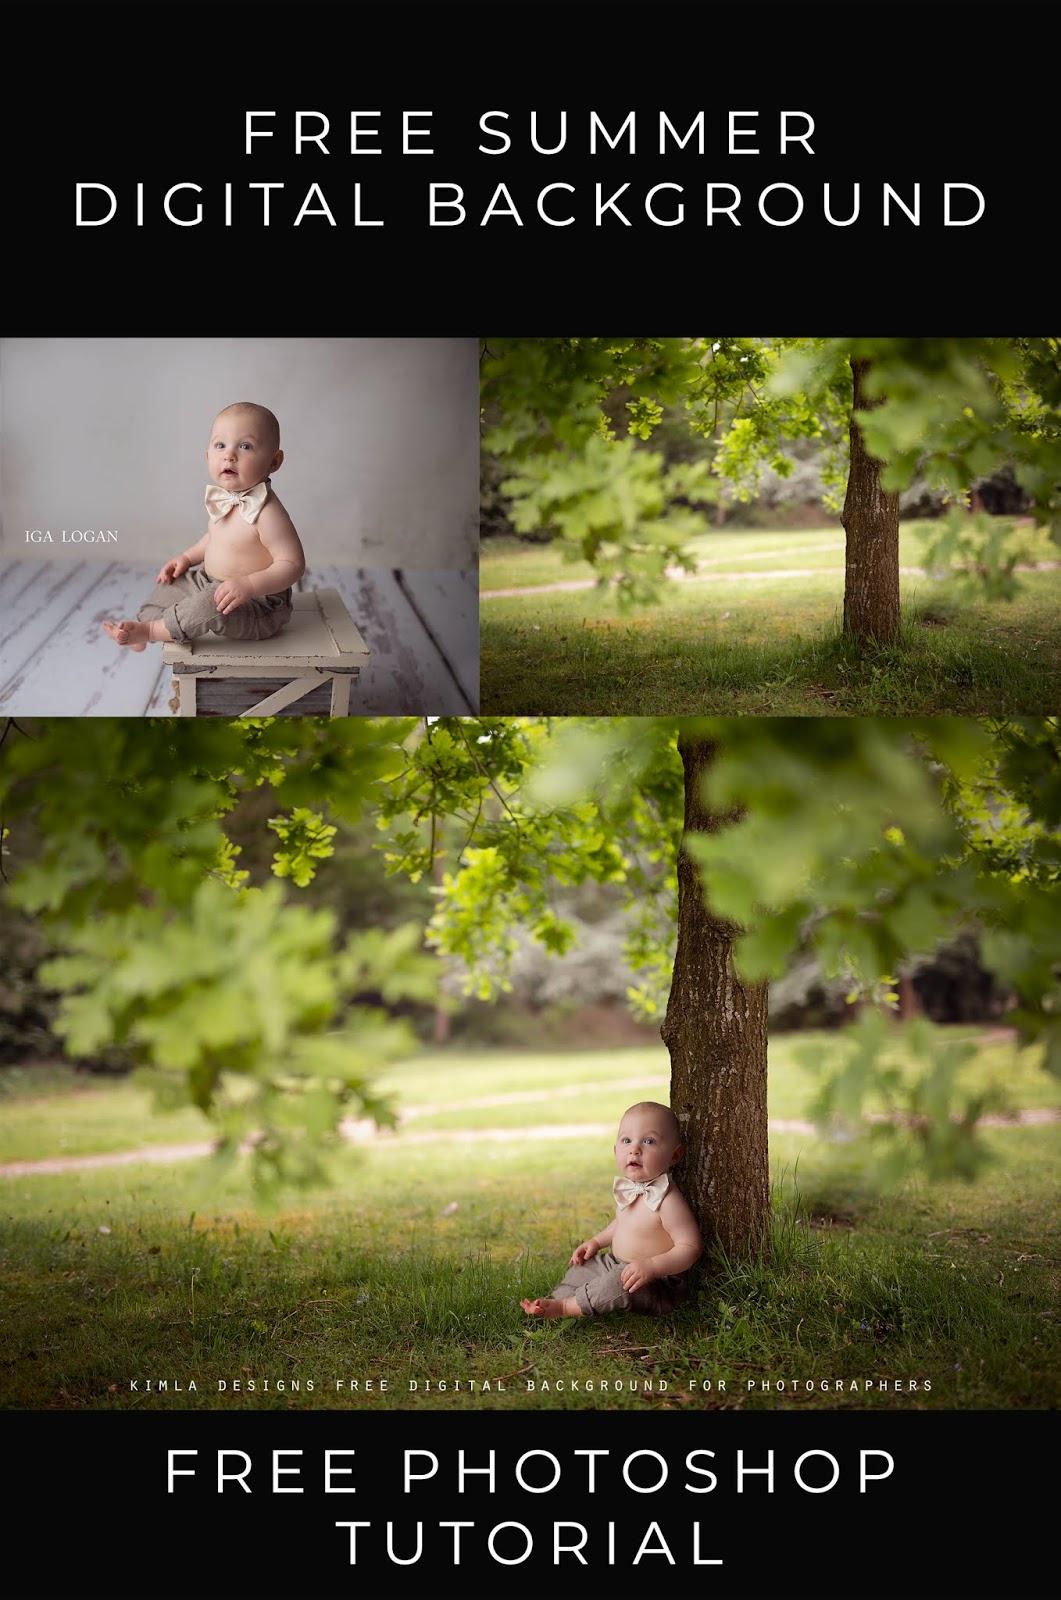 https://2.bp.blogspot.com/-qzIK-yx3Qwk/Wv09R7ODiKI/AAAAAAAAEG4/JDuNW0sxIJkBtSdTIWfId33eD3y_FfEoQCLcBGAs/s1600/Free-Summer-Digital-background-for-Photographers-by-Kimla-Designs-and-Photoshop-Tutorial.jpg